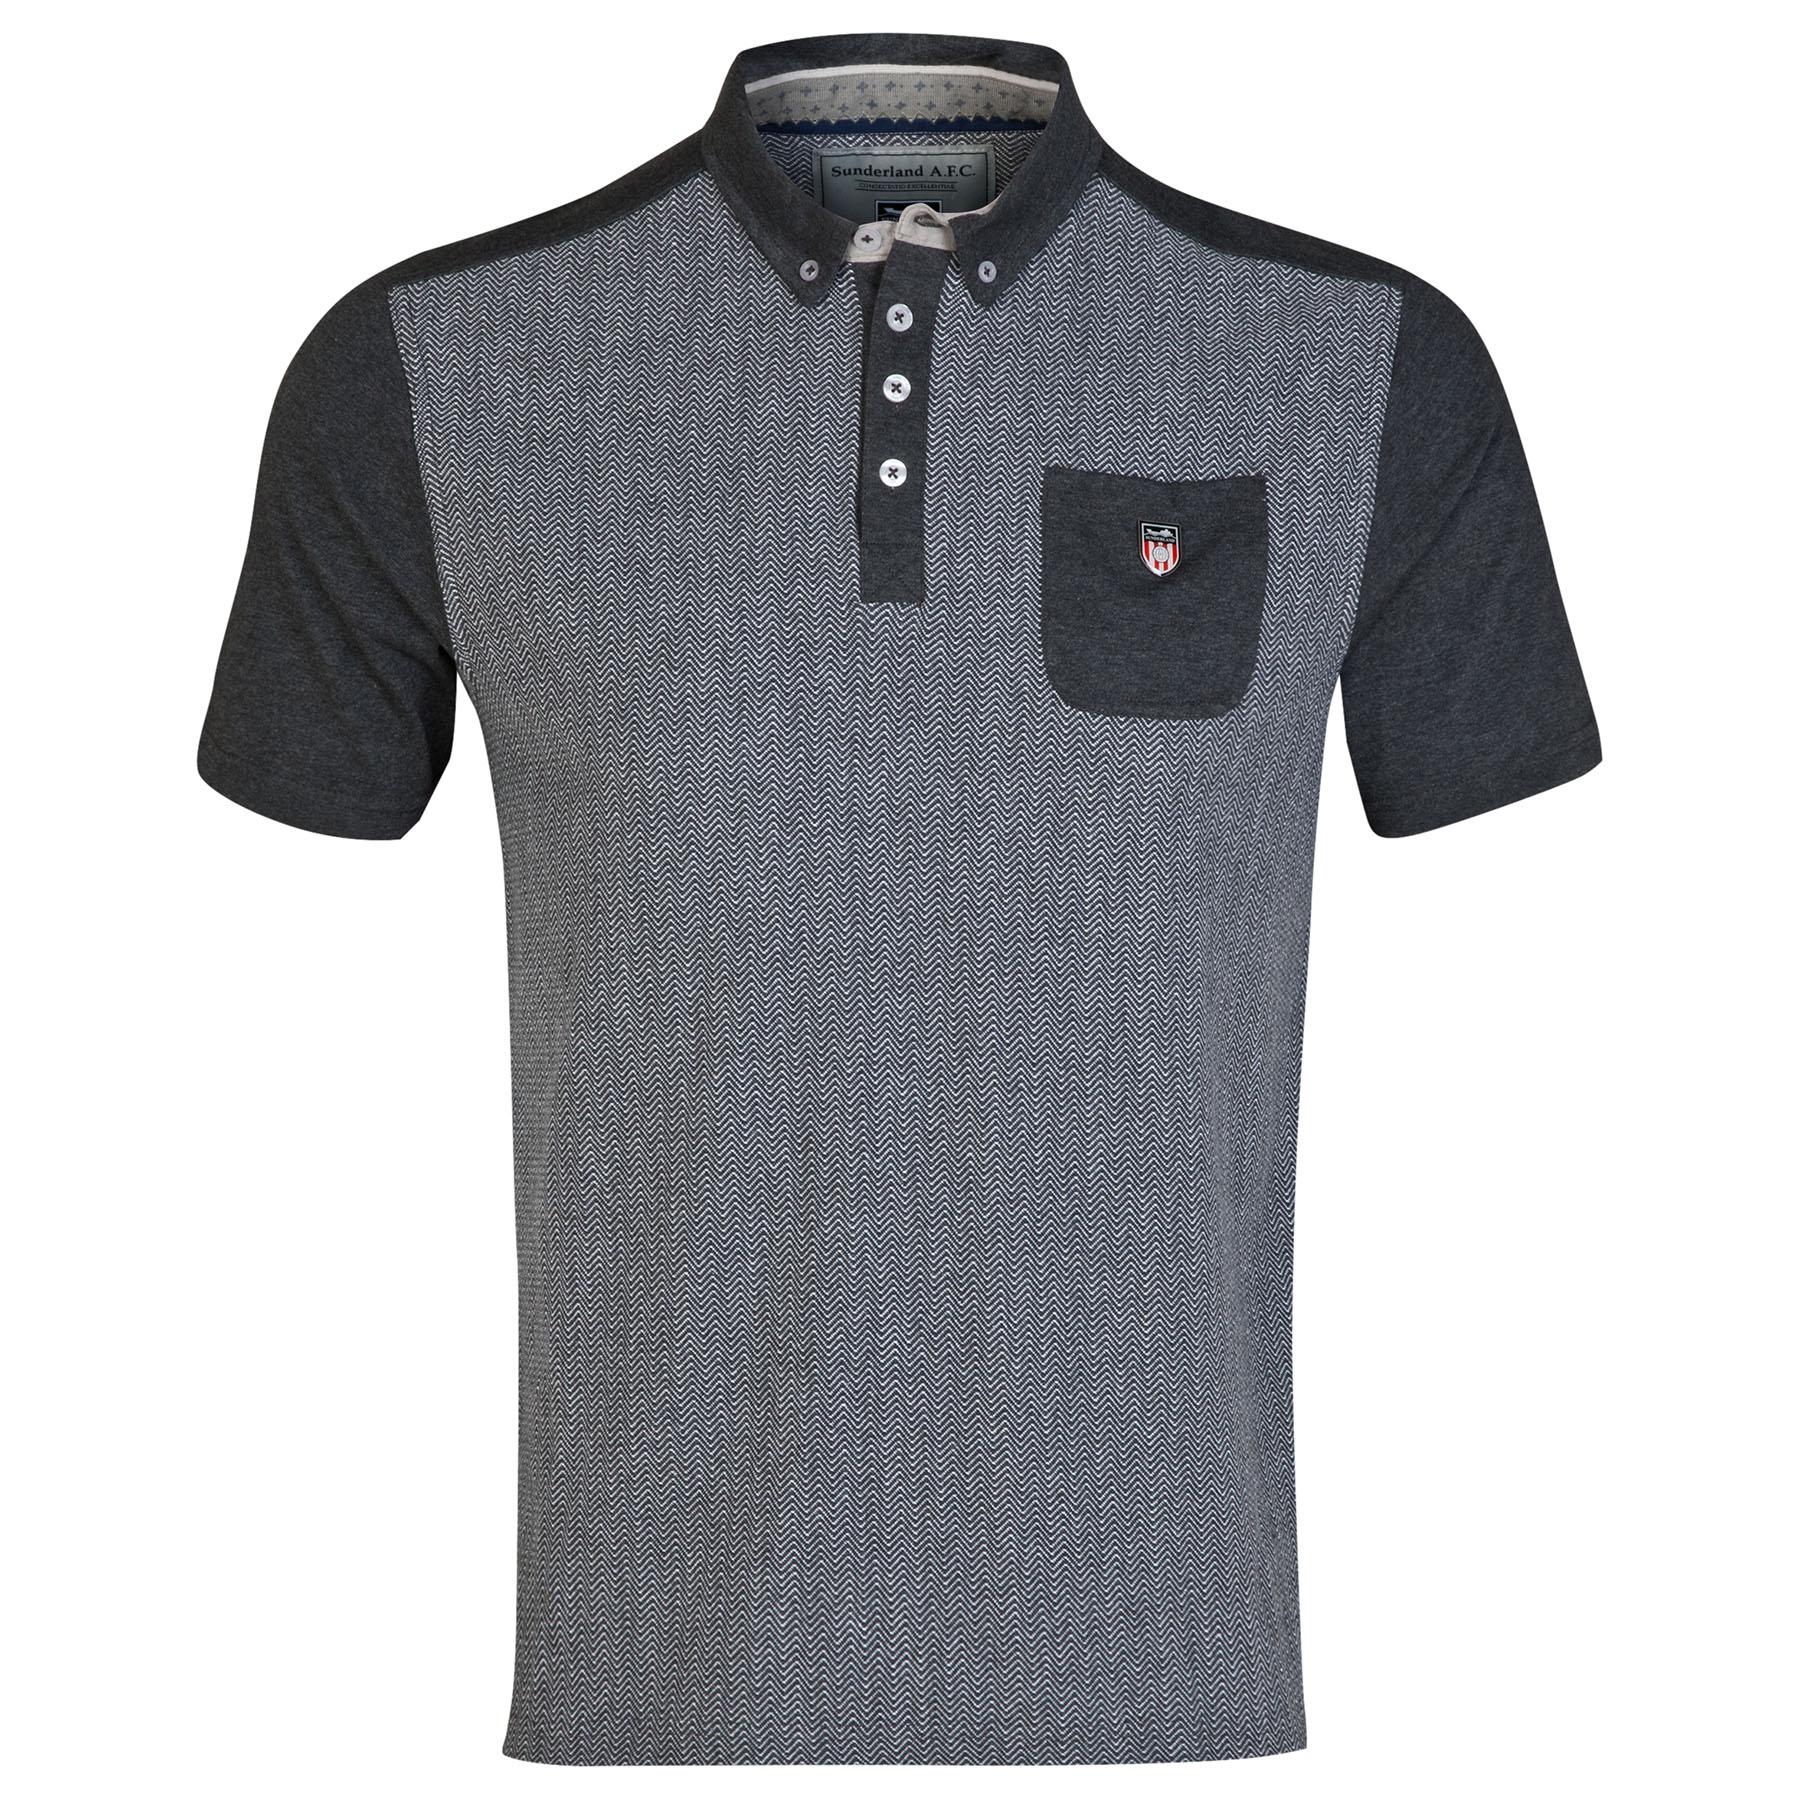 Sunderland Polo Shirt- - Charcoal - Mens